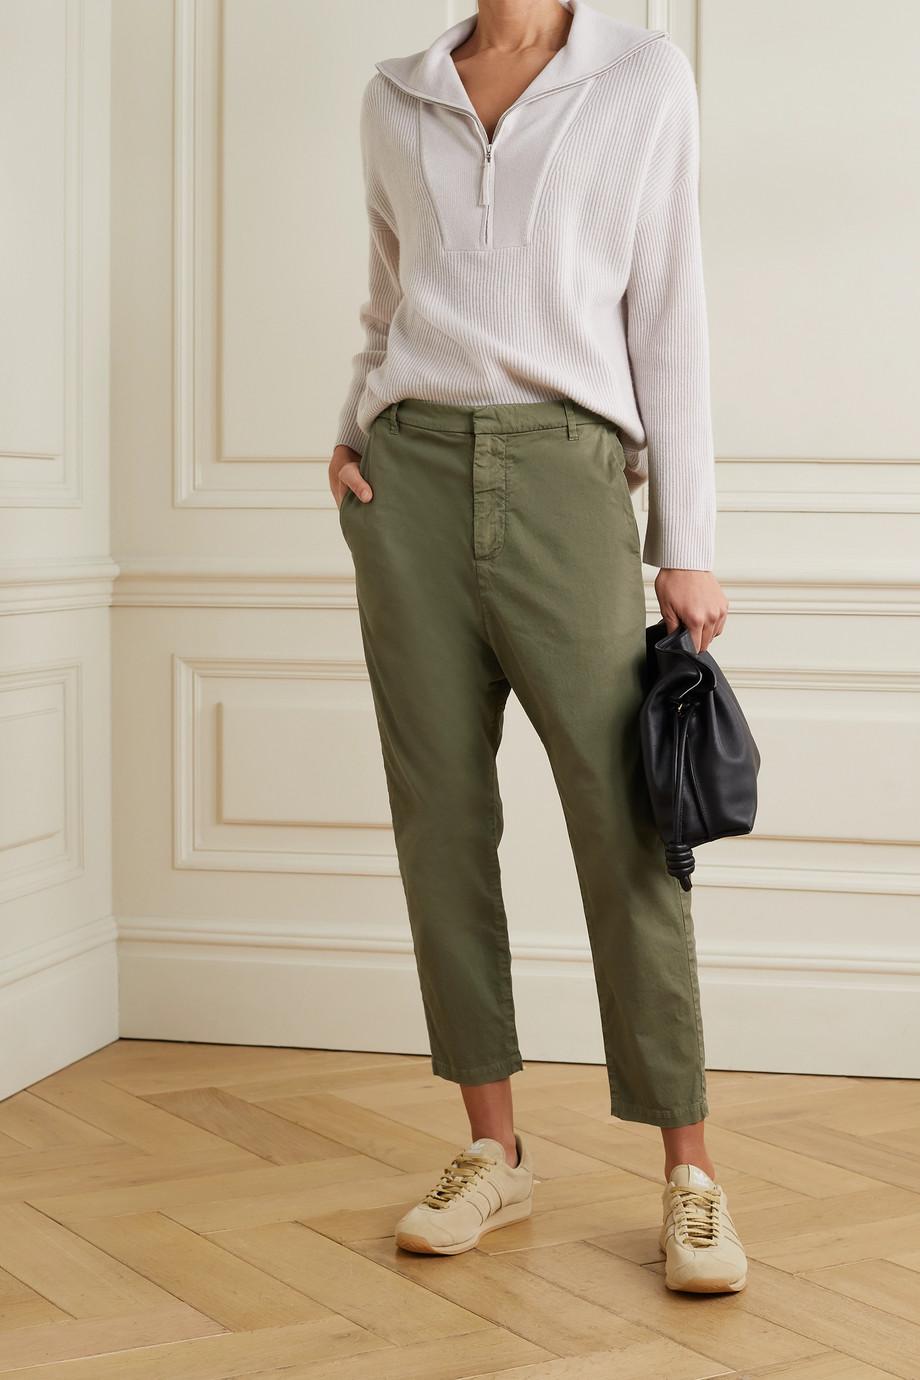 Nili Lotan Pantalon raccourci en serge de coton mélangé Paris